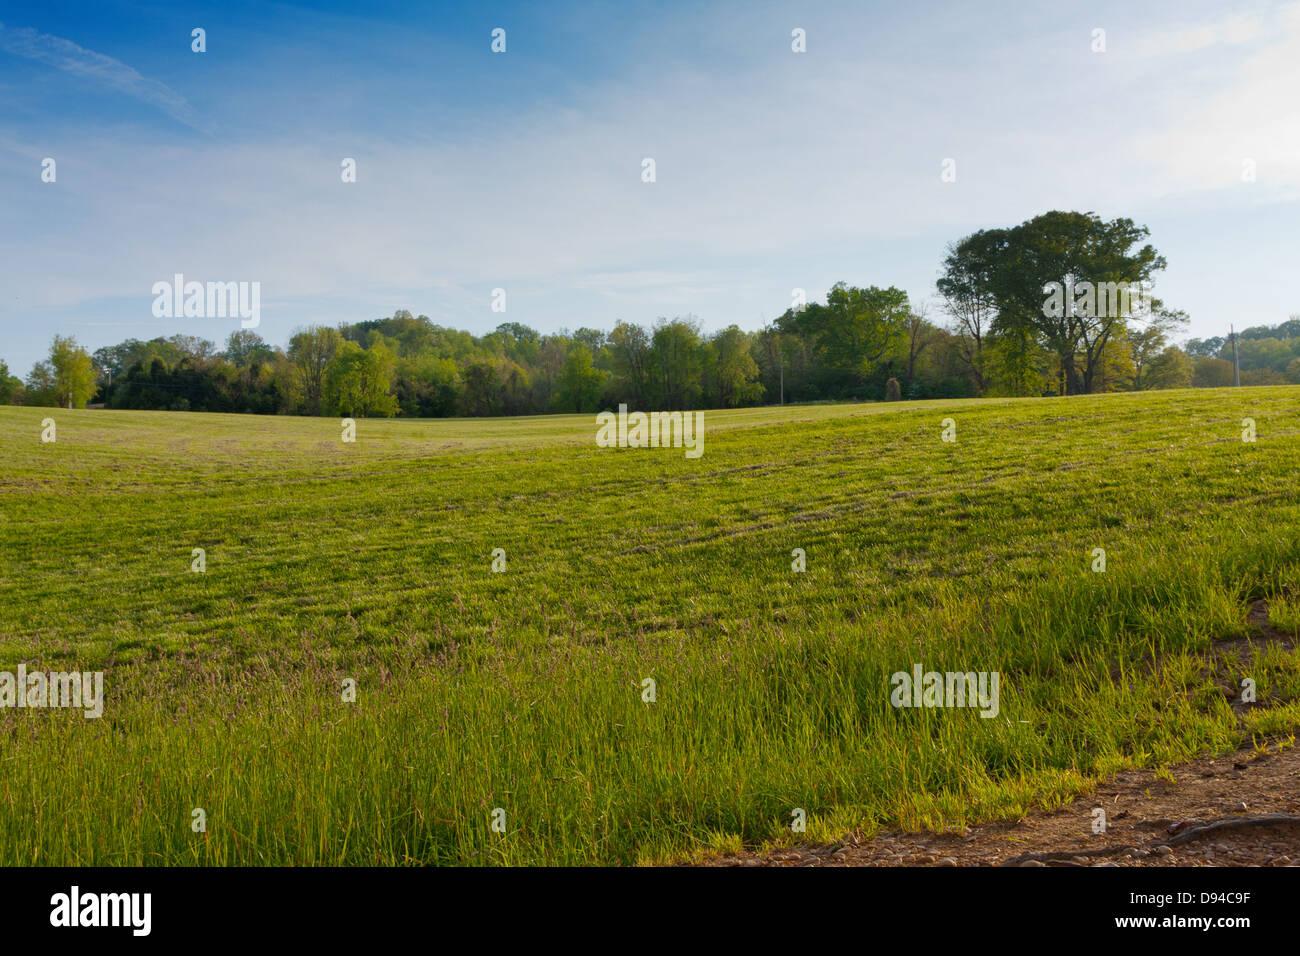 Geflügelte lieber Park, Johnson, Tennessee Stockbild